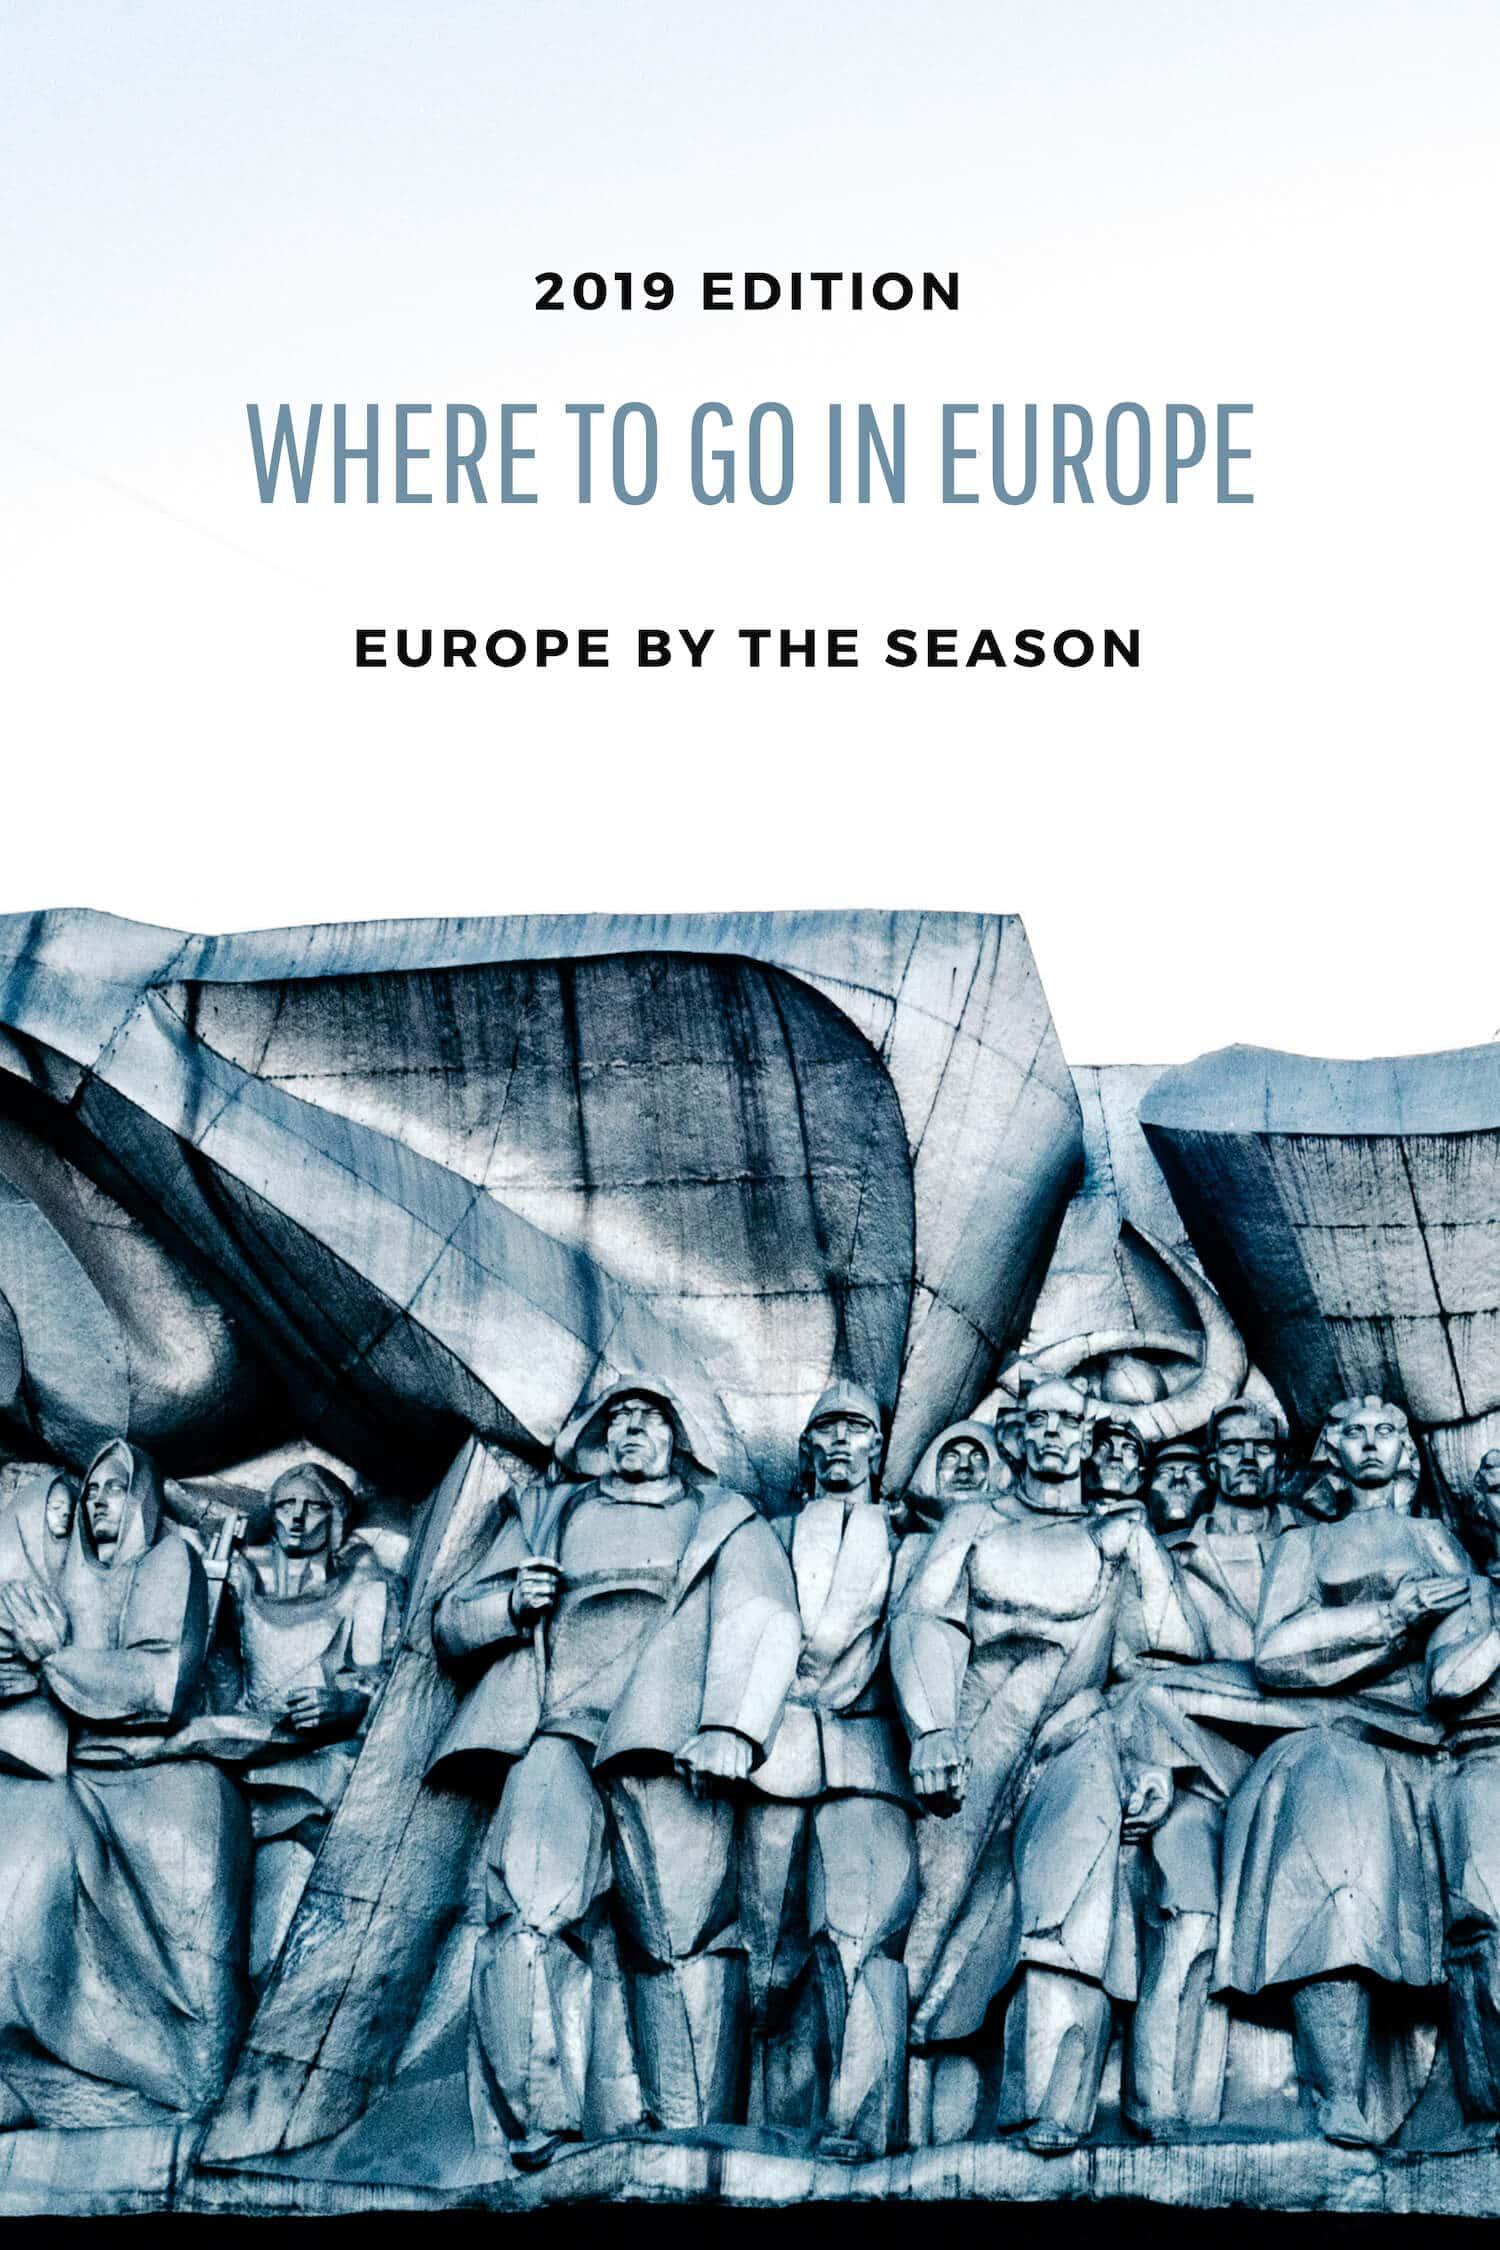 Visit Europe in 2019